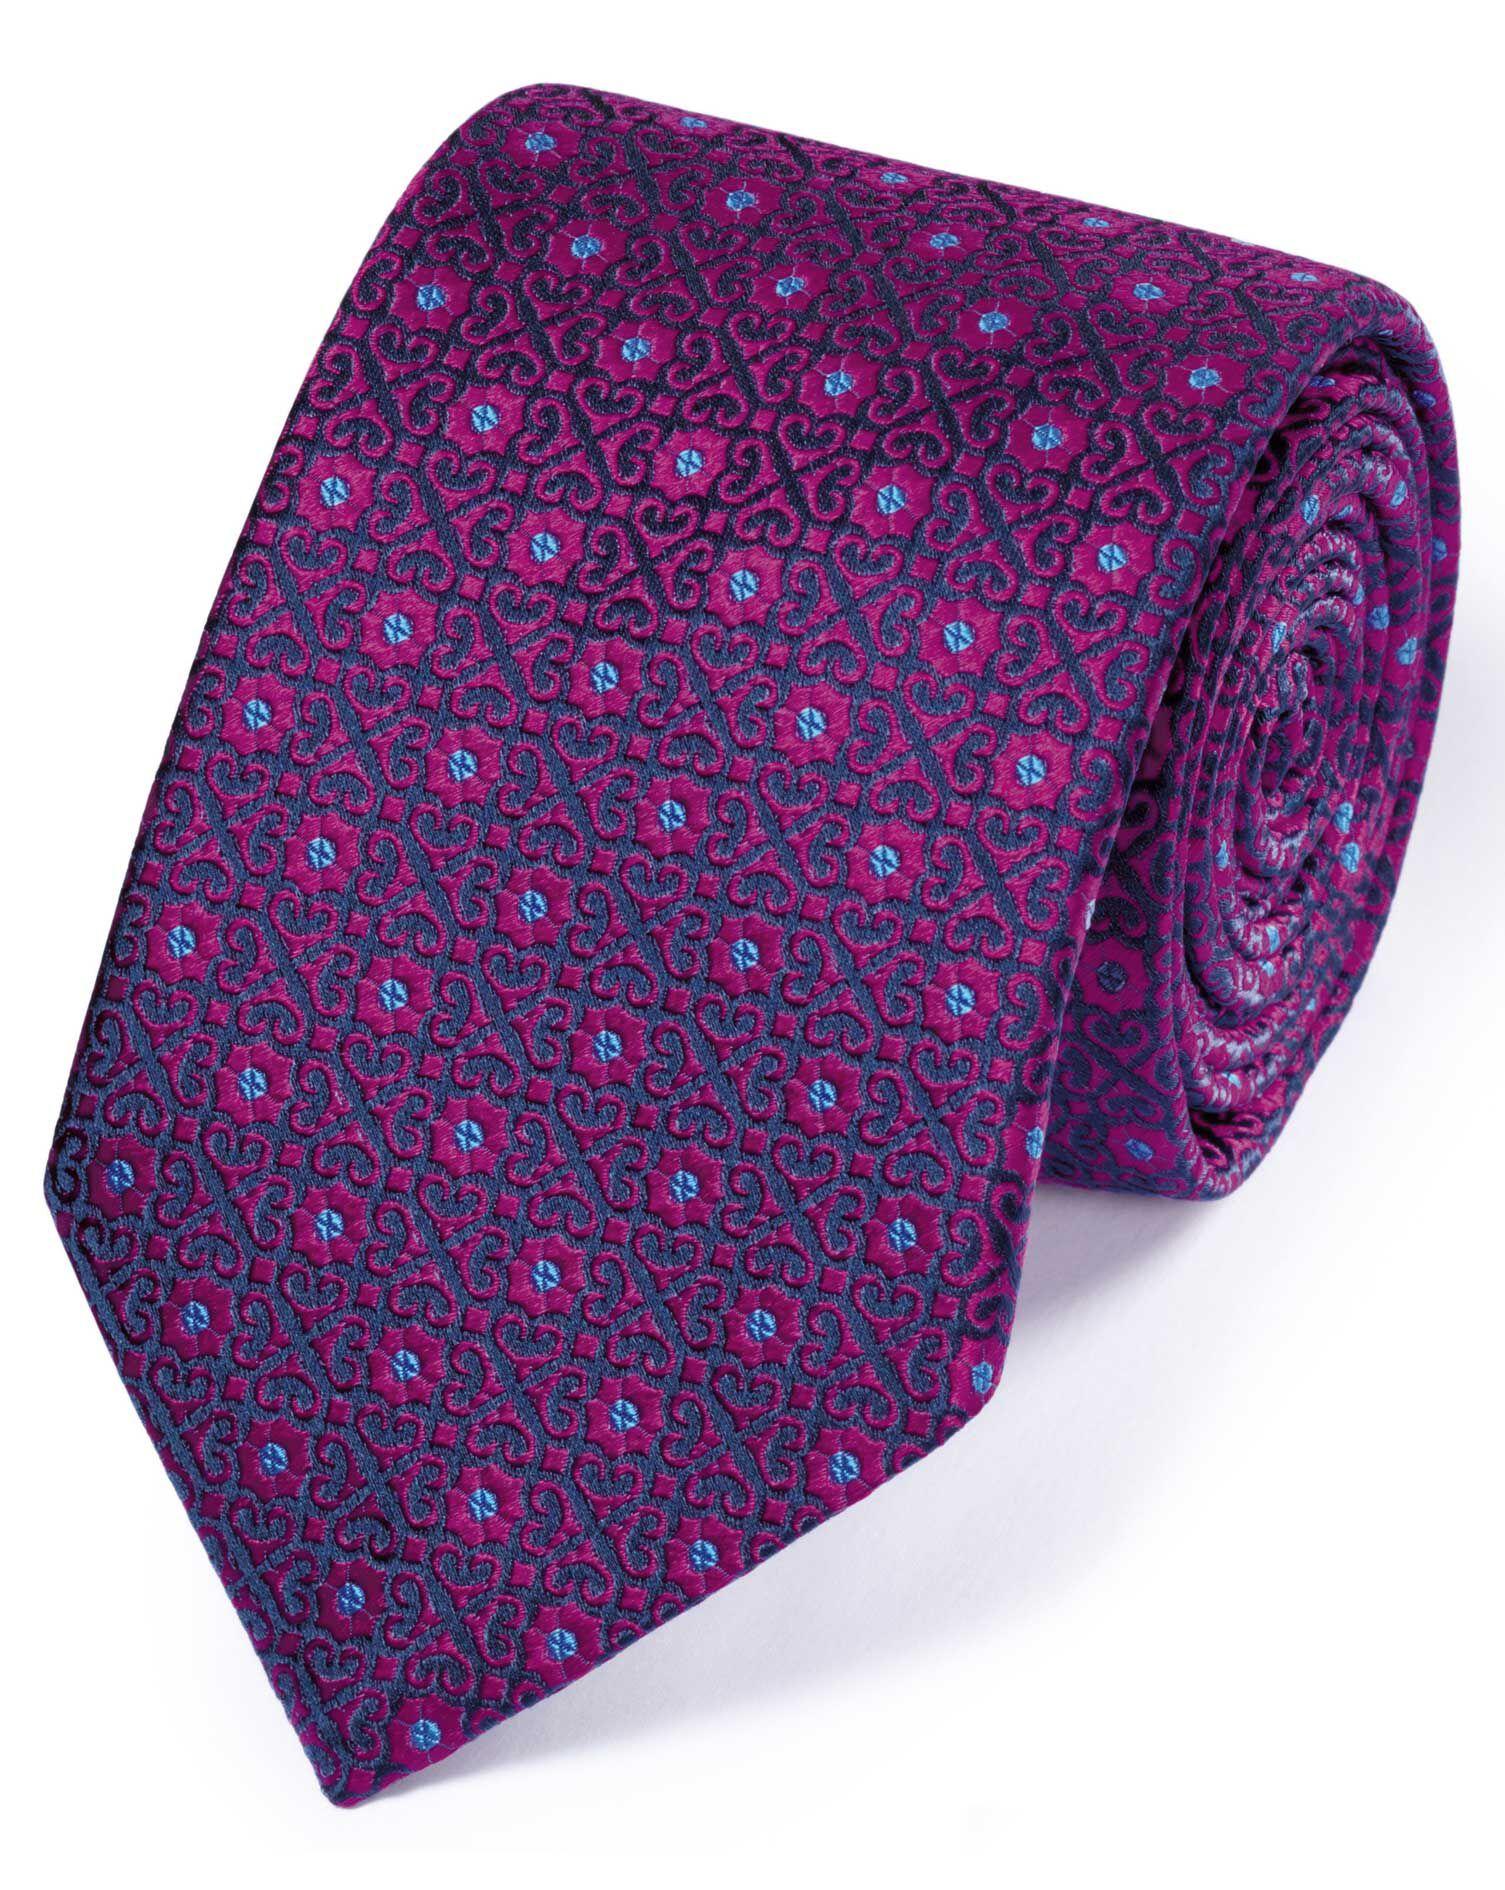 Magenta Silk English Luxury Geometric Tie Size OSFA by Charles Tyrwhitt